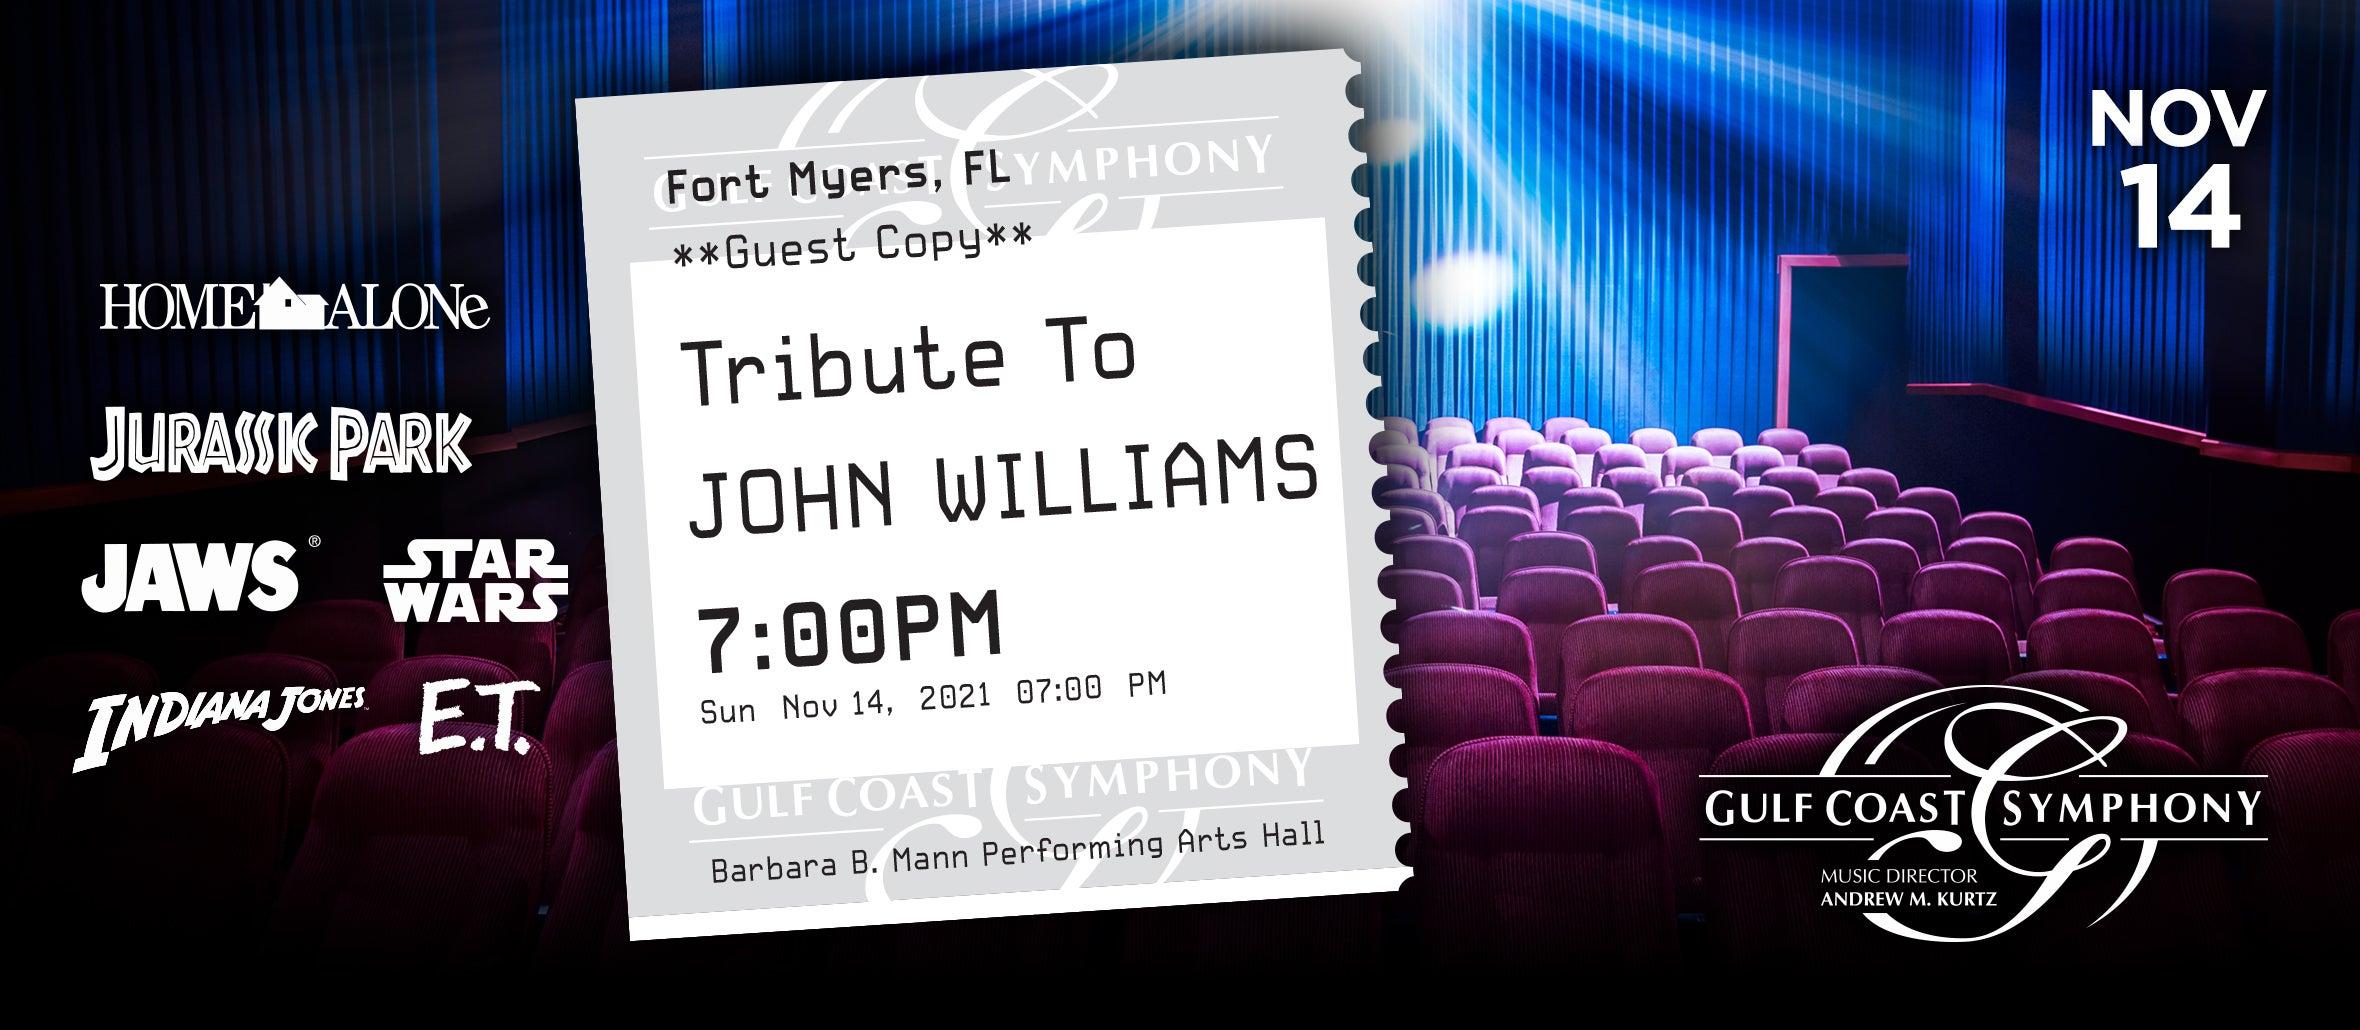 Gulf Coast Symphony: A Tribute to John Williams